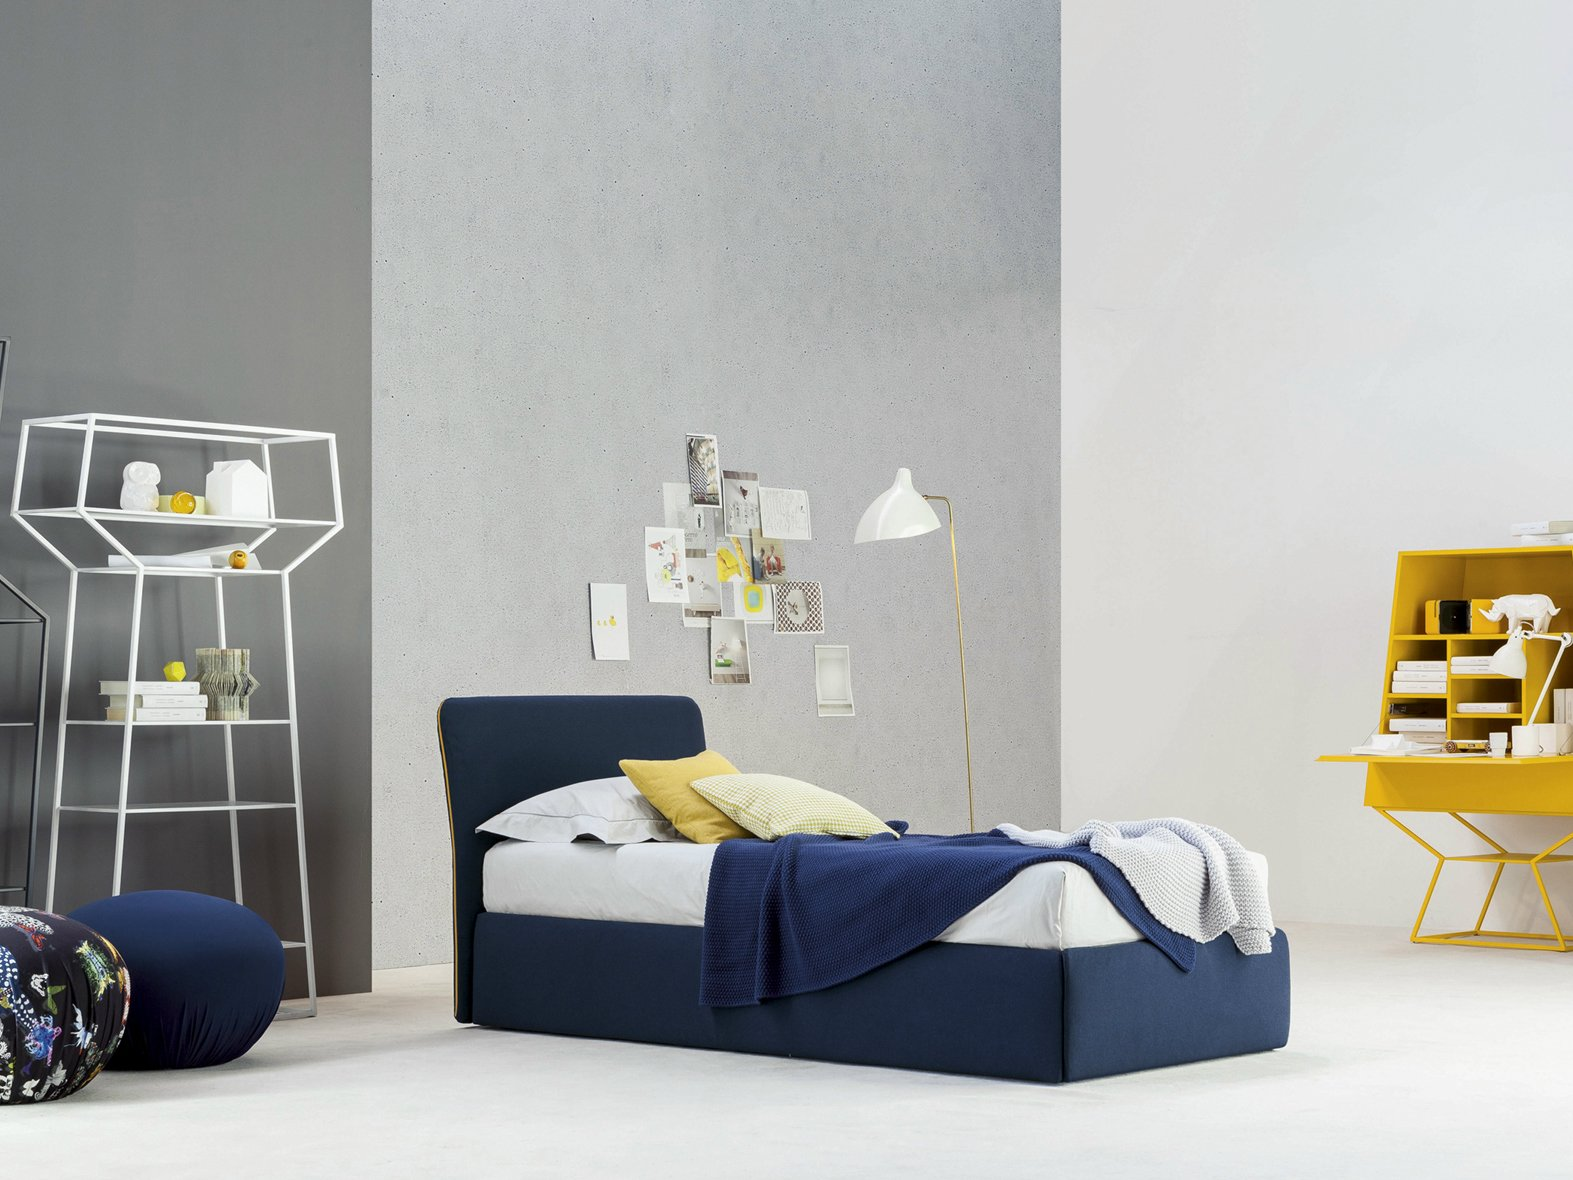 True letto singolo by bonaldo - Letto singolo testiera imbottita ...